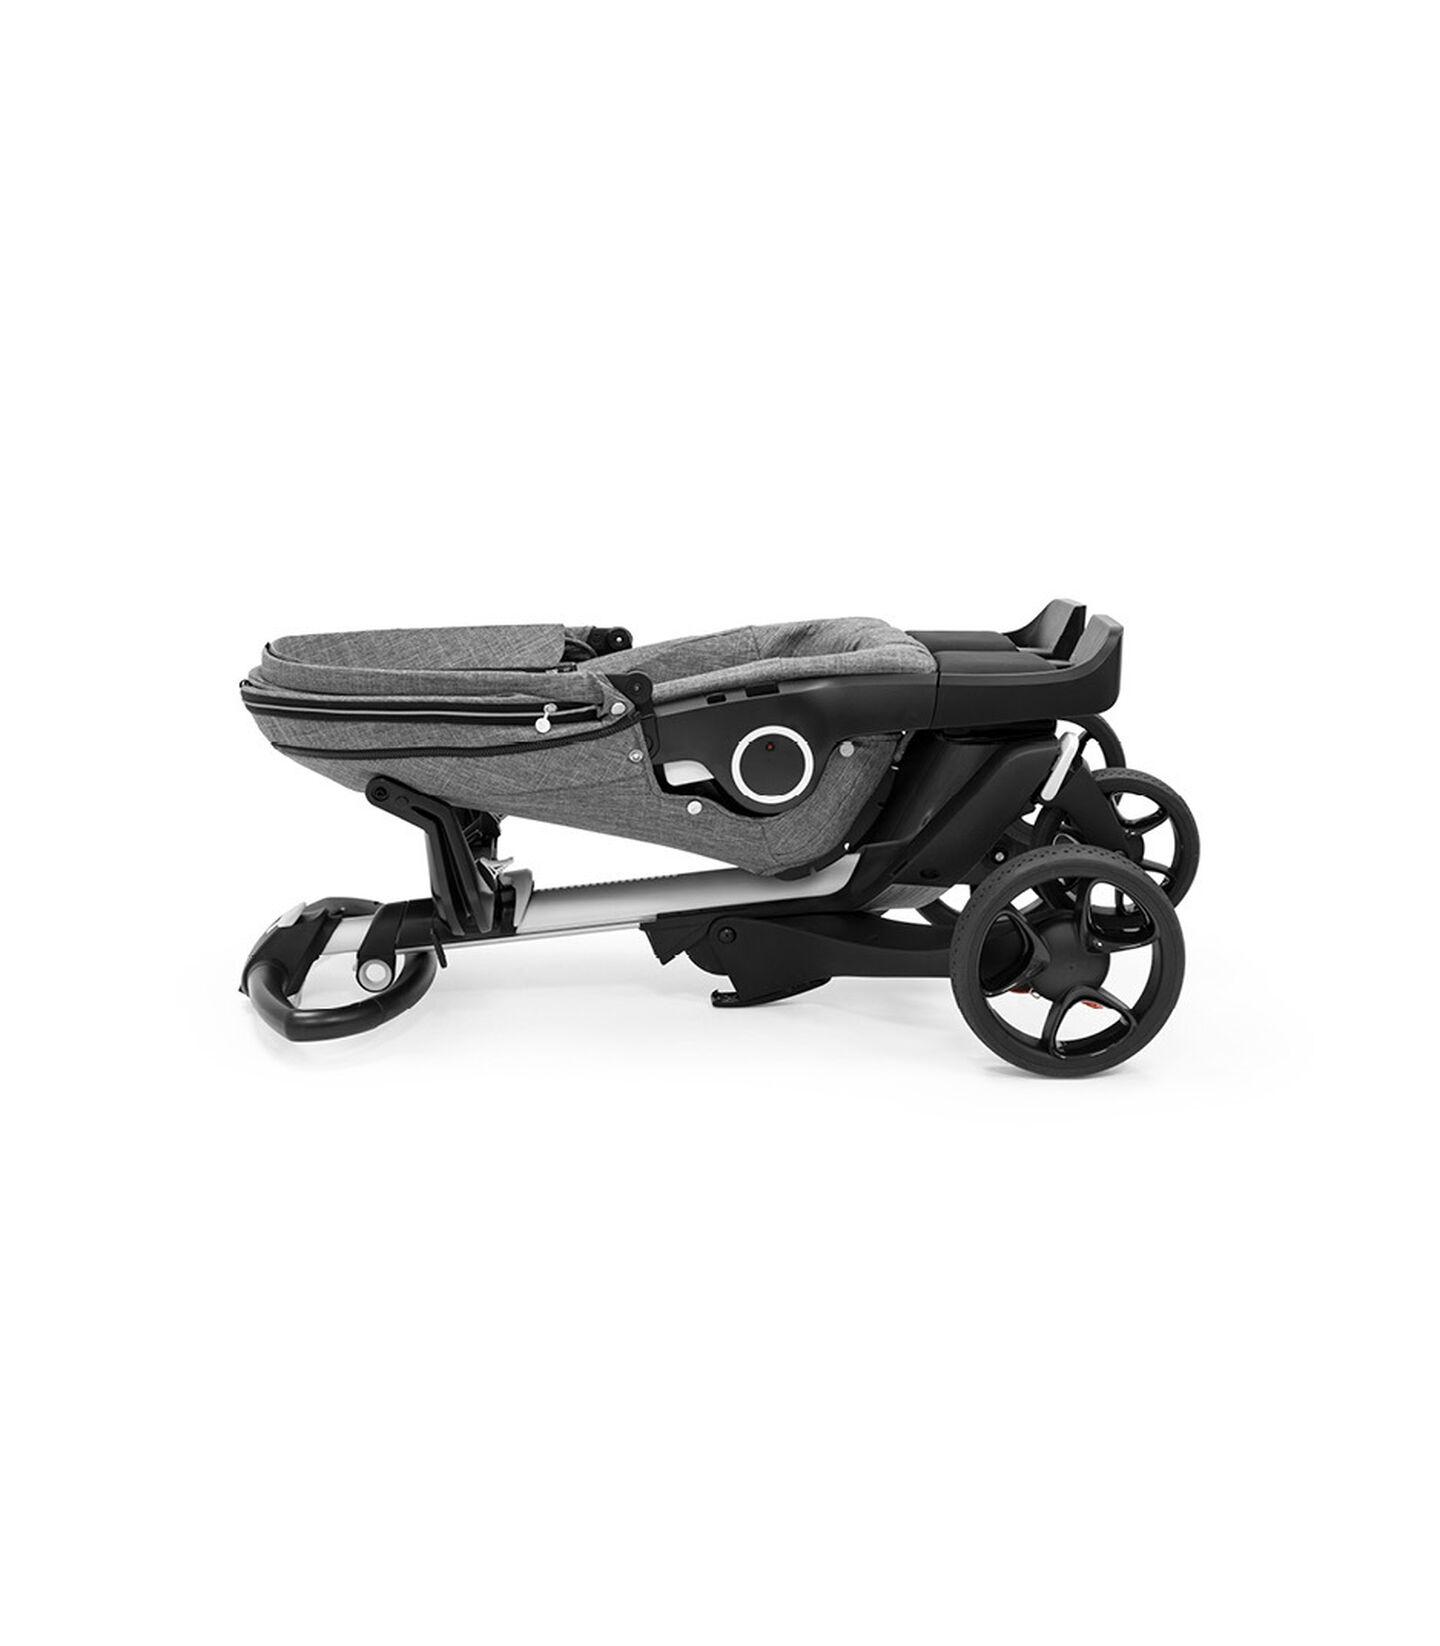 Stokke® Xplory® Silver chassis and  Stokke® Stroller Seat , Black Melange. Folded.